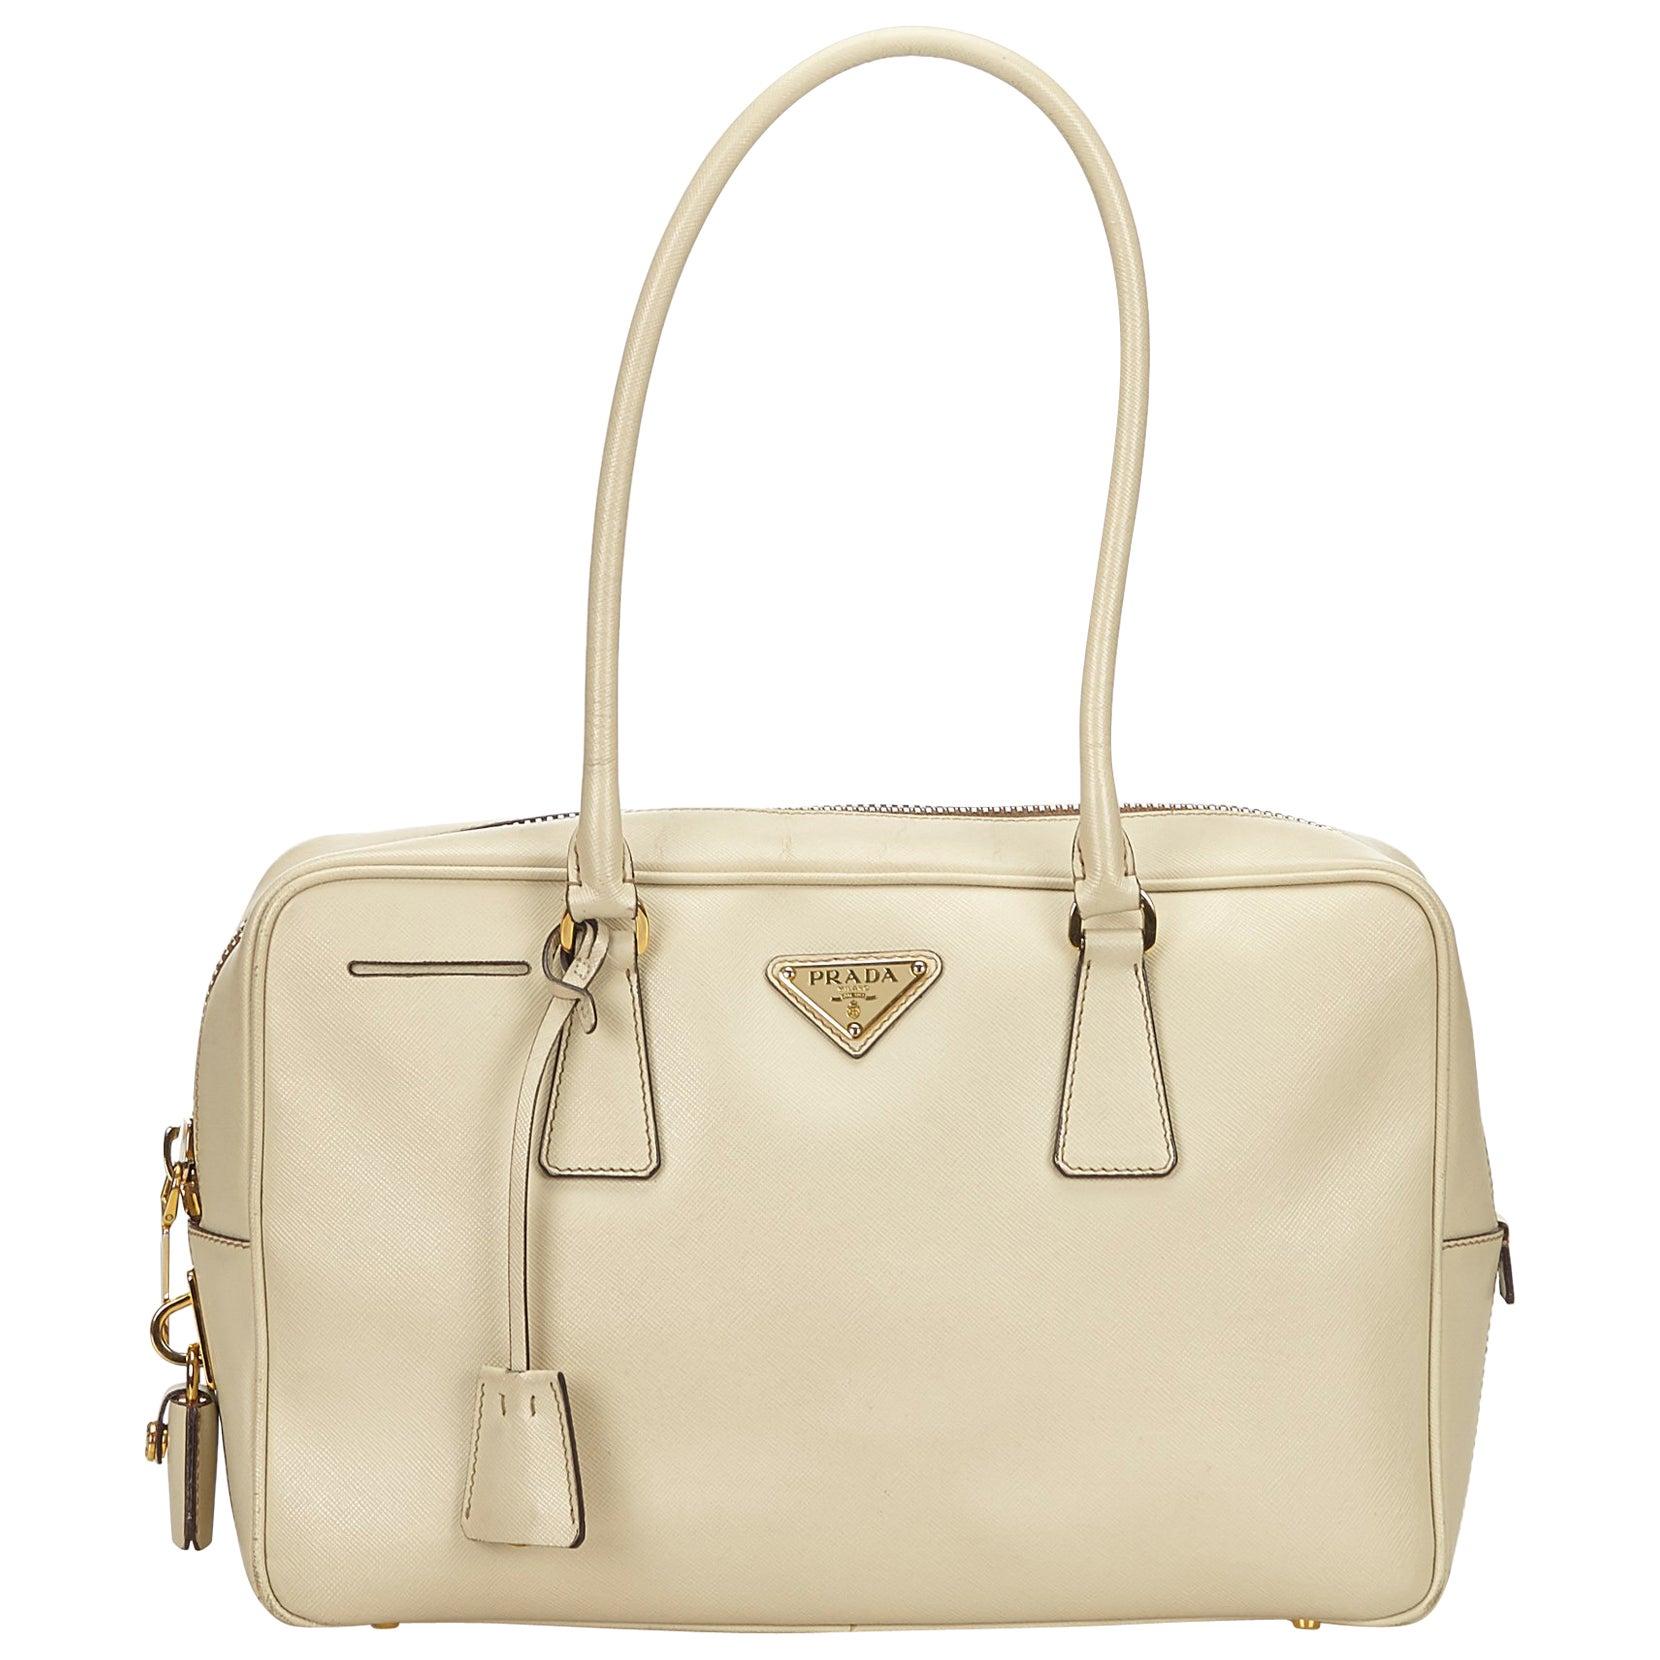 4038f66b6d82 Prada White Saffiano Leather Bag at 1stdibs